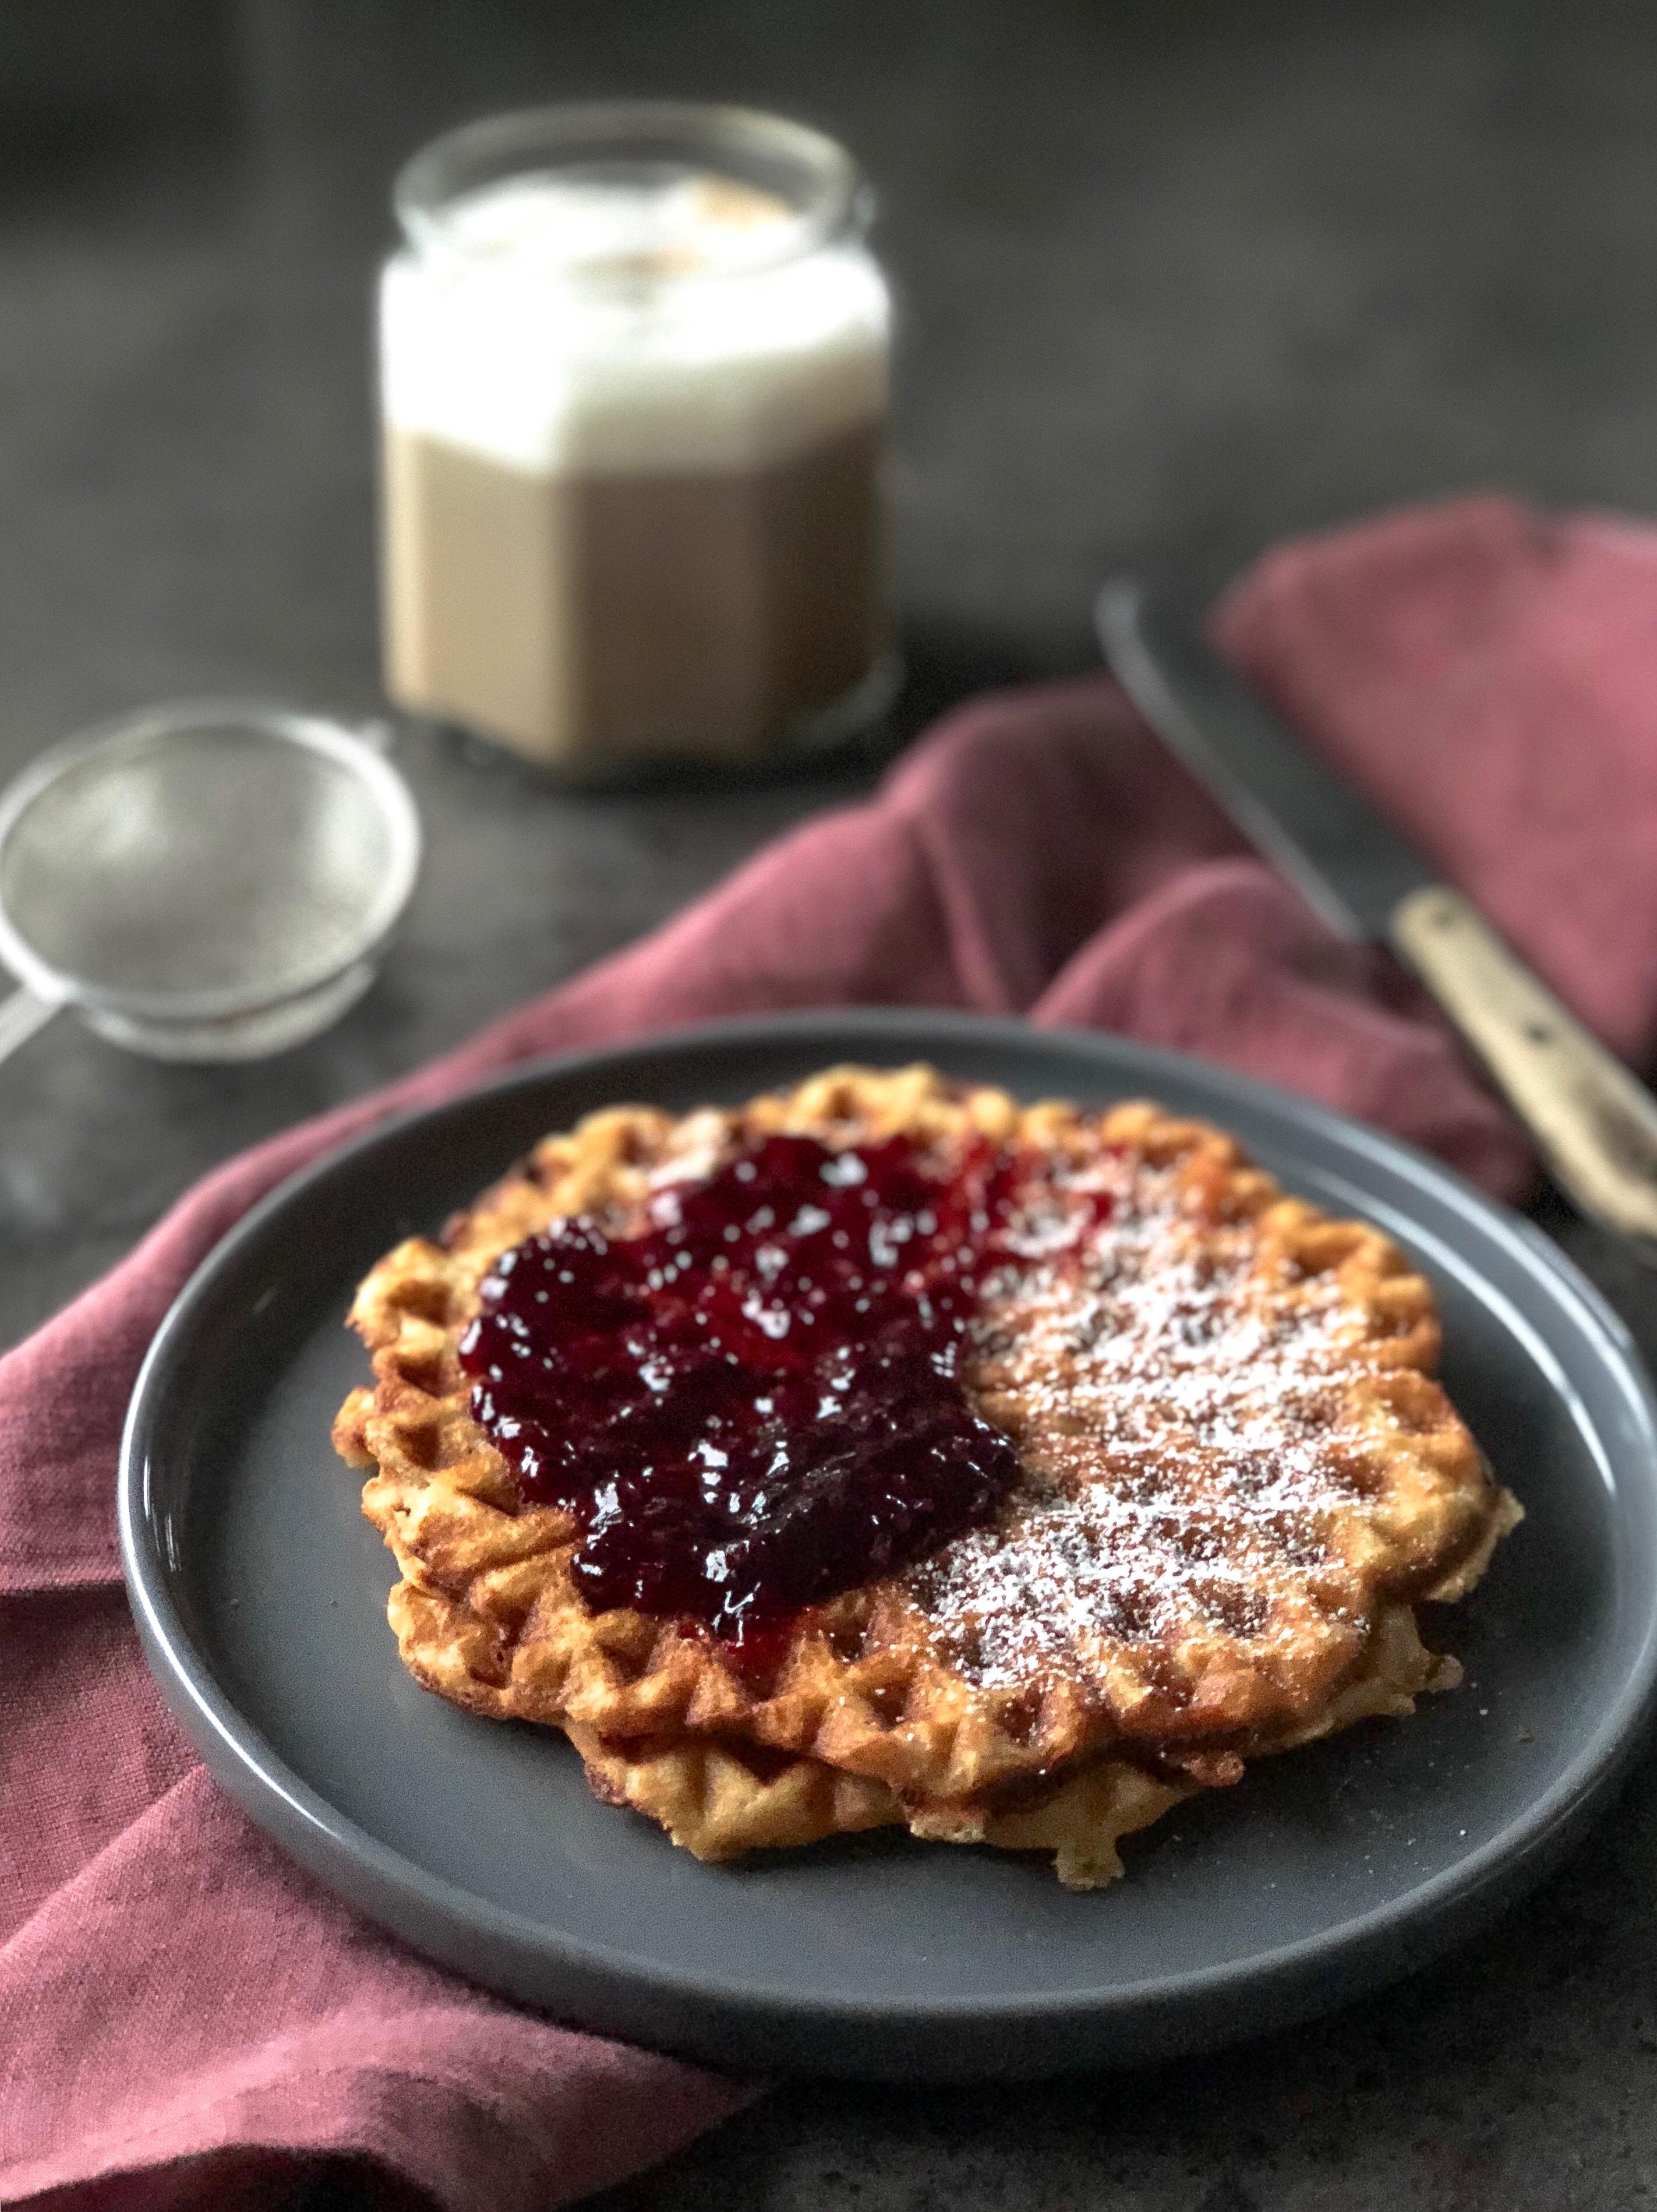 Sprøde vafler med vanilje, Morgenmad, Brunch, Dessert